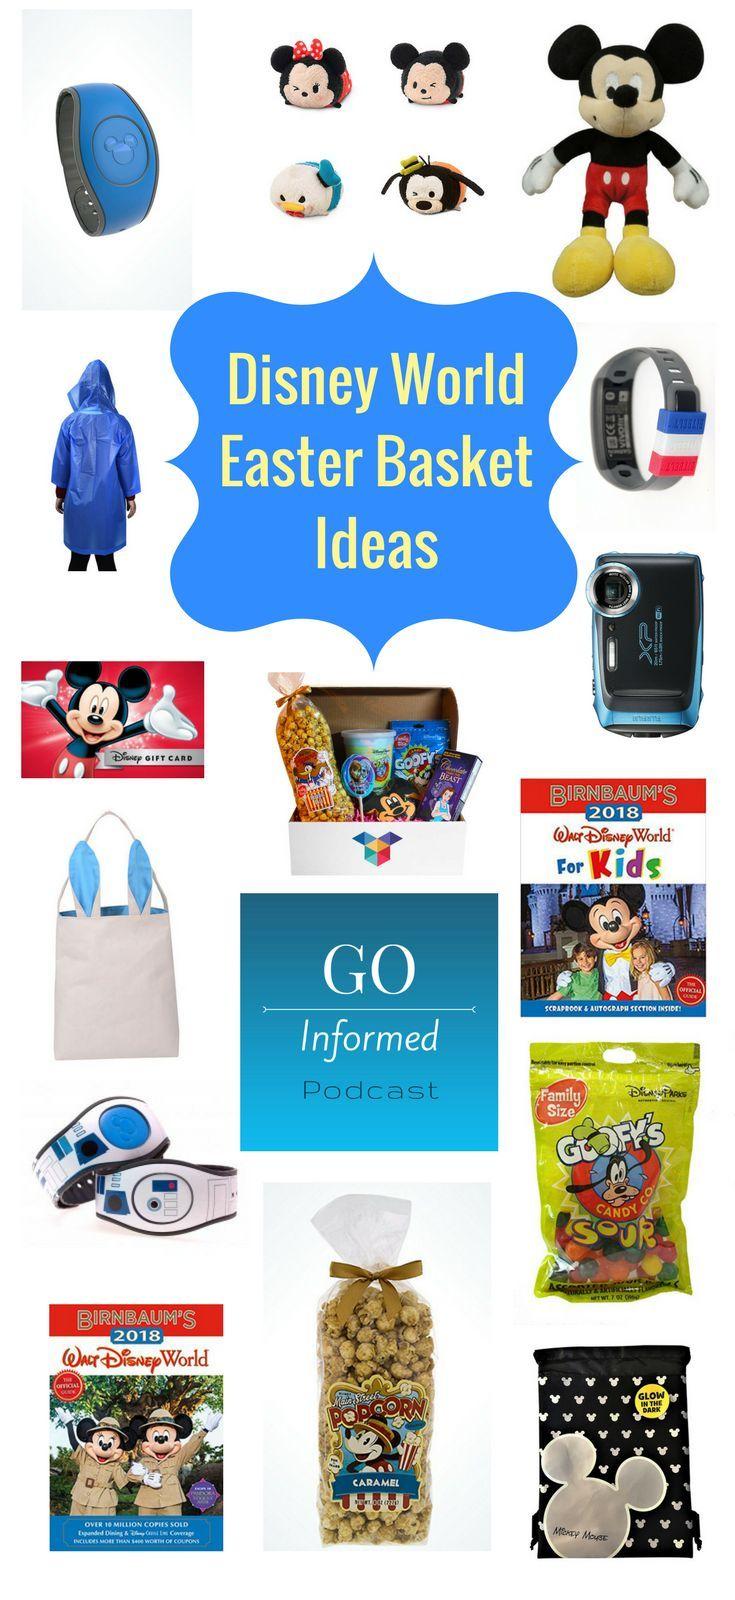 disney world easter basket ideas disney beyond disney world rh pinterest com